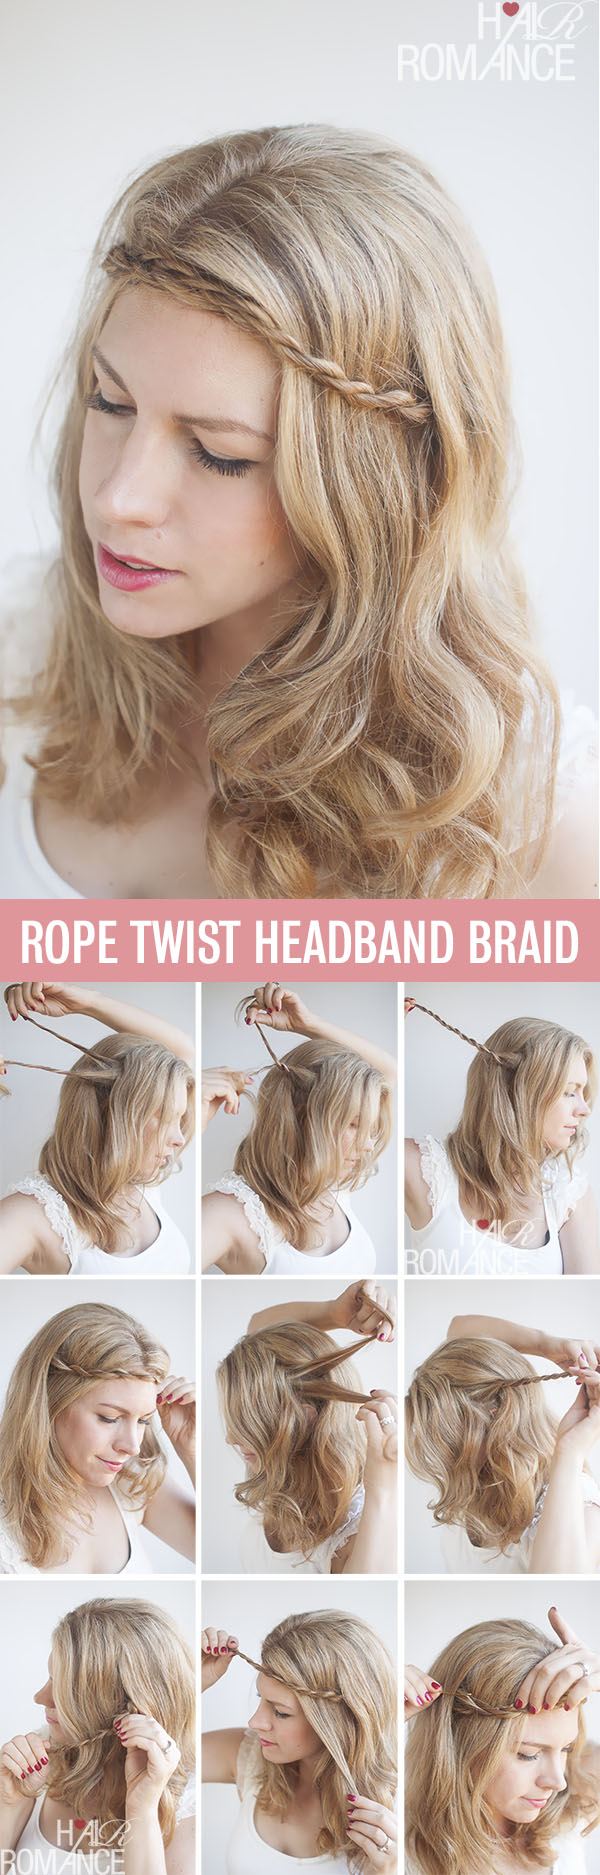 Hair Romance - rope braided headband tutorial